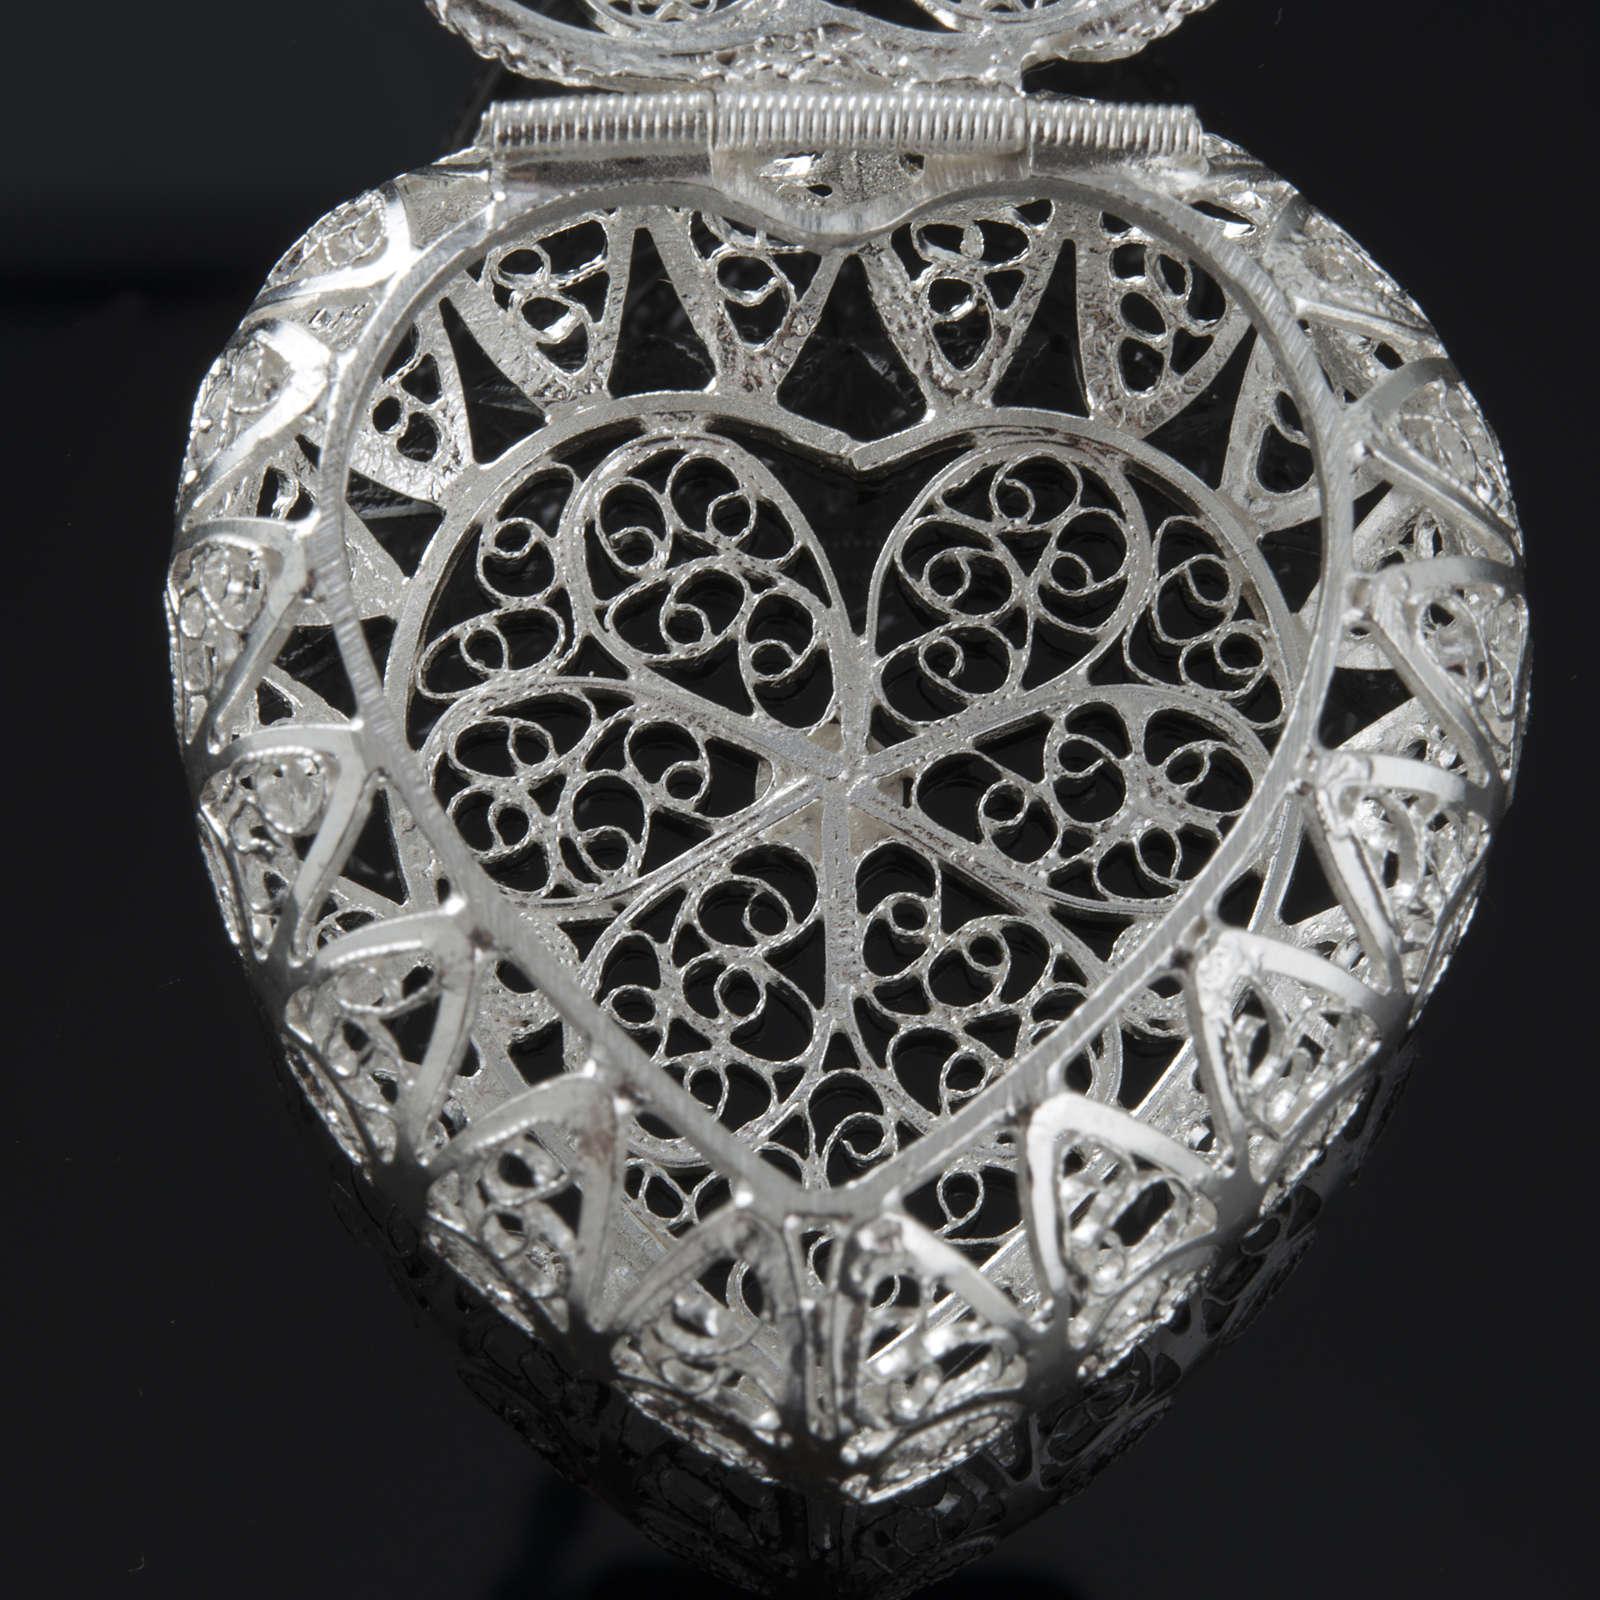 Rosenkranz Kästchen Silber 800, Filigran, Herz 4